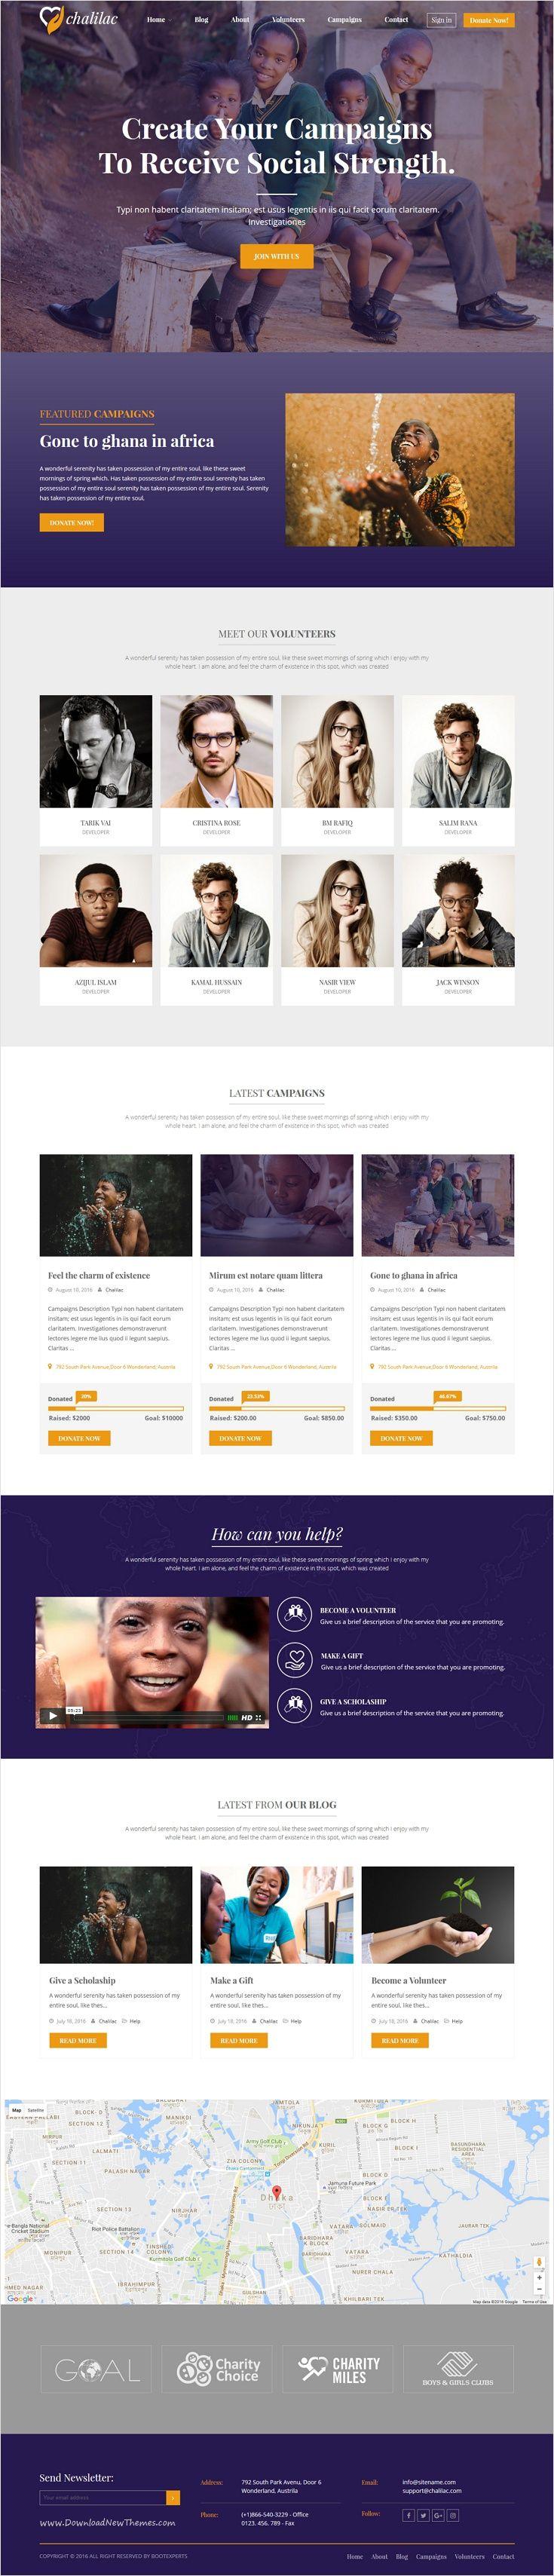 Gmail theme gone - Chalilac Wordpress Charity Theme